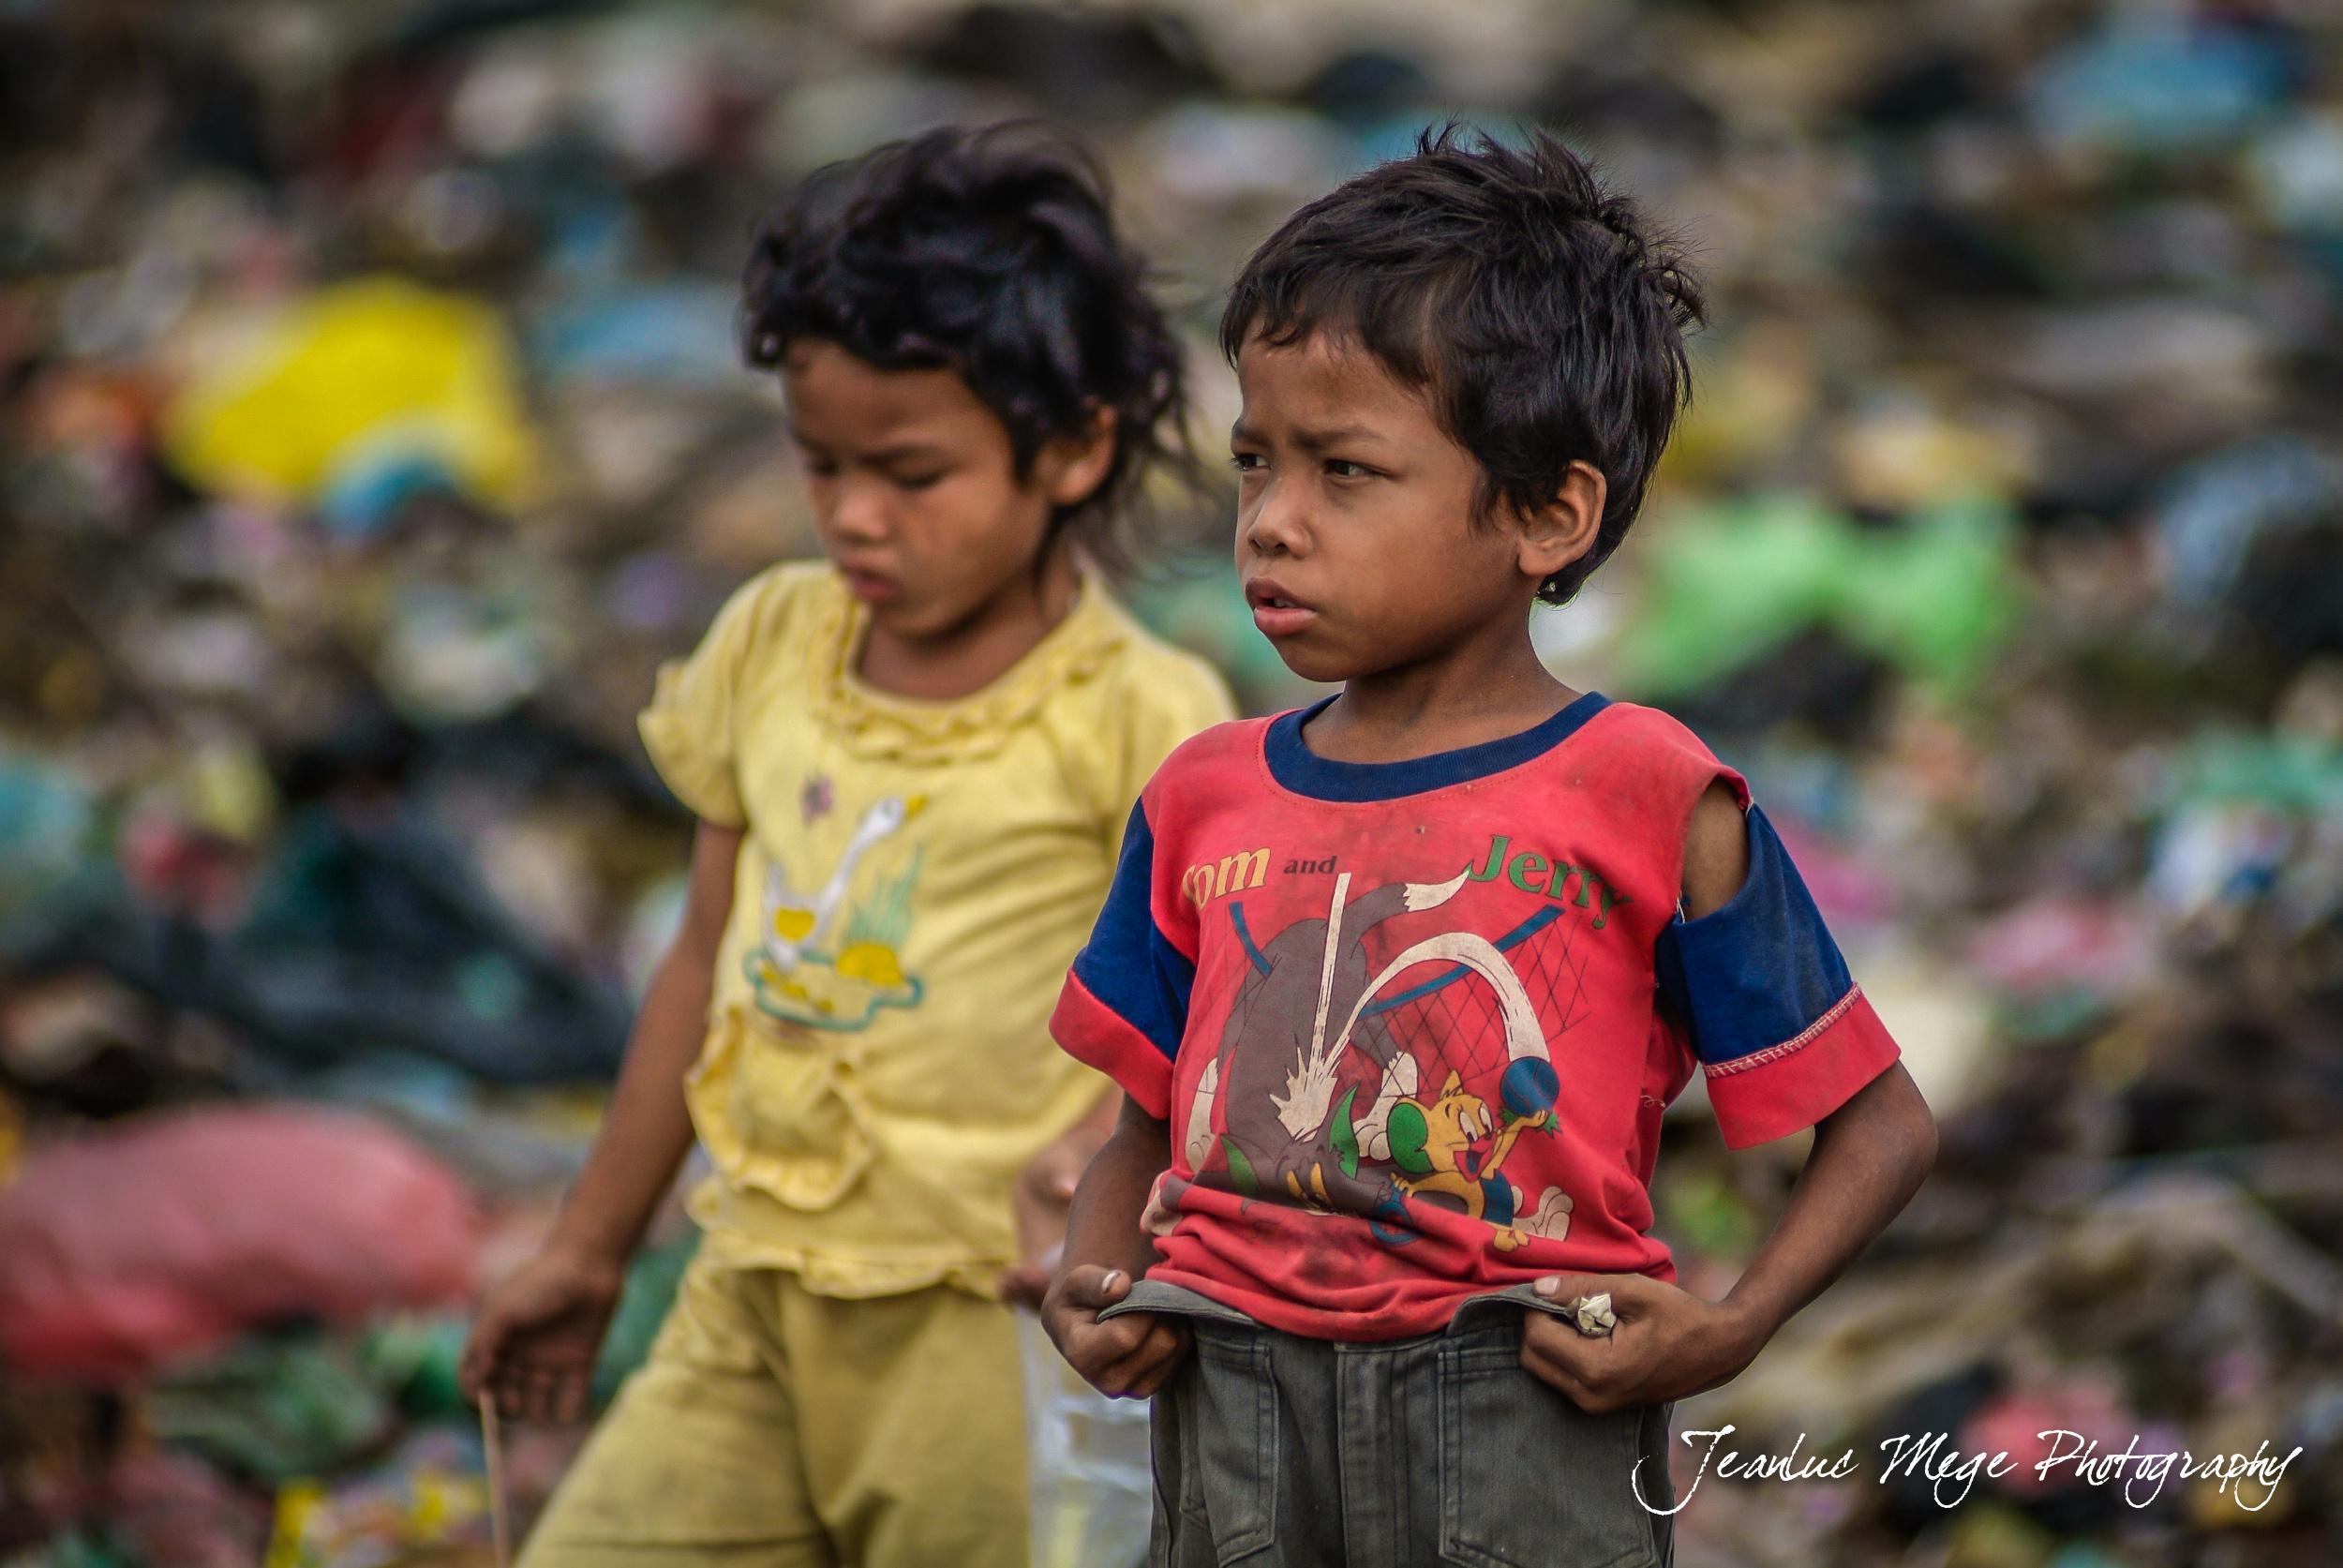 Jean Luc Mege Cambodia-8950.jpg